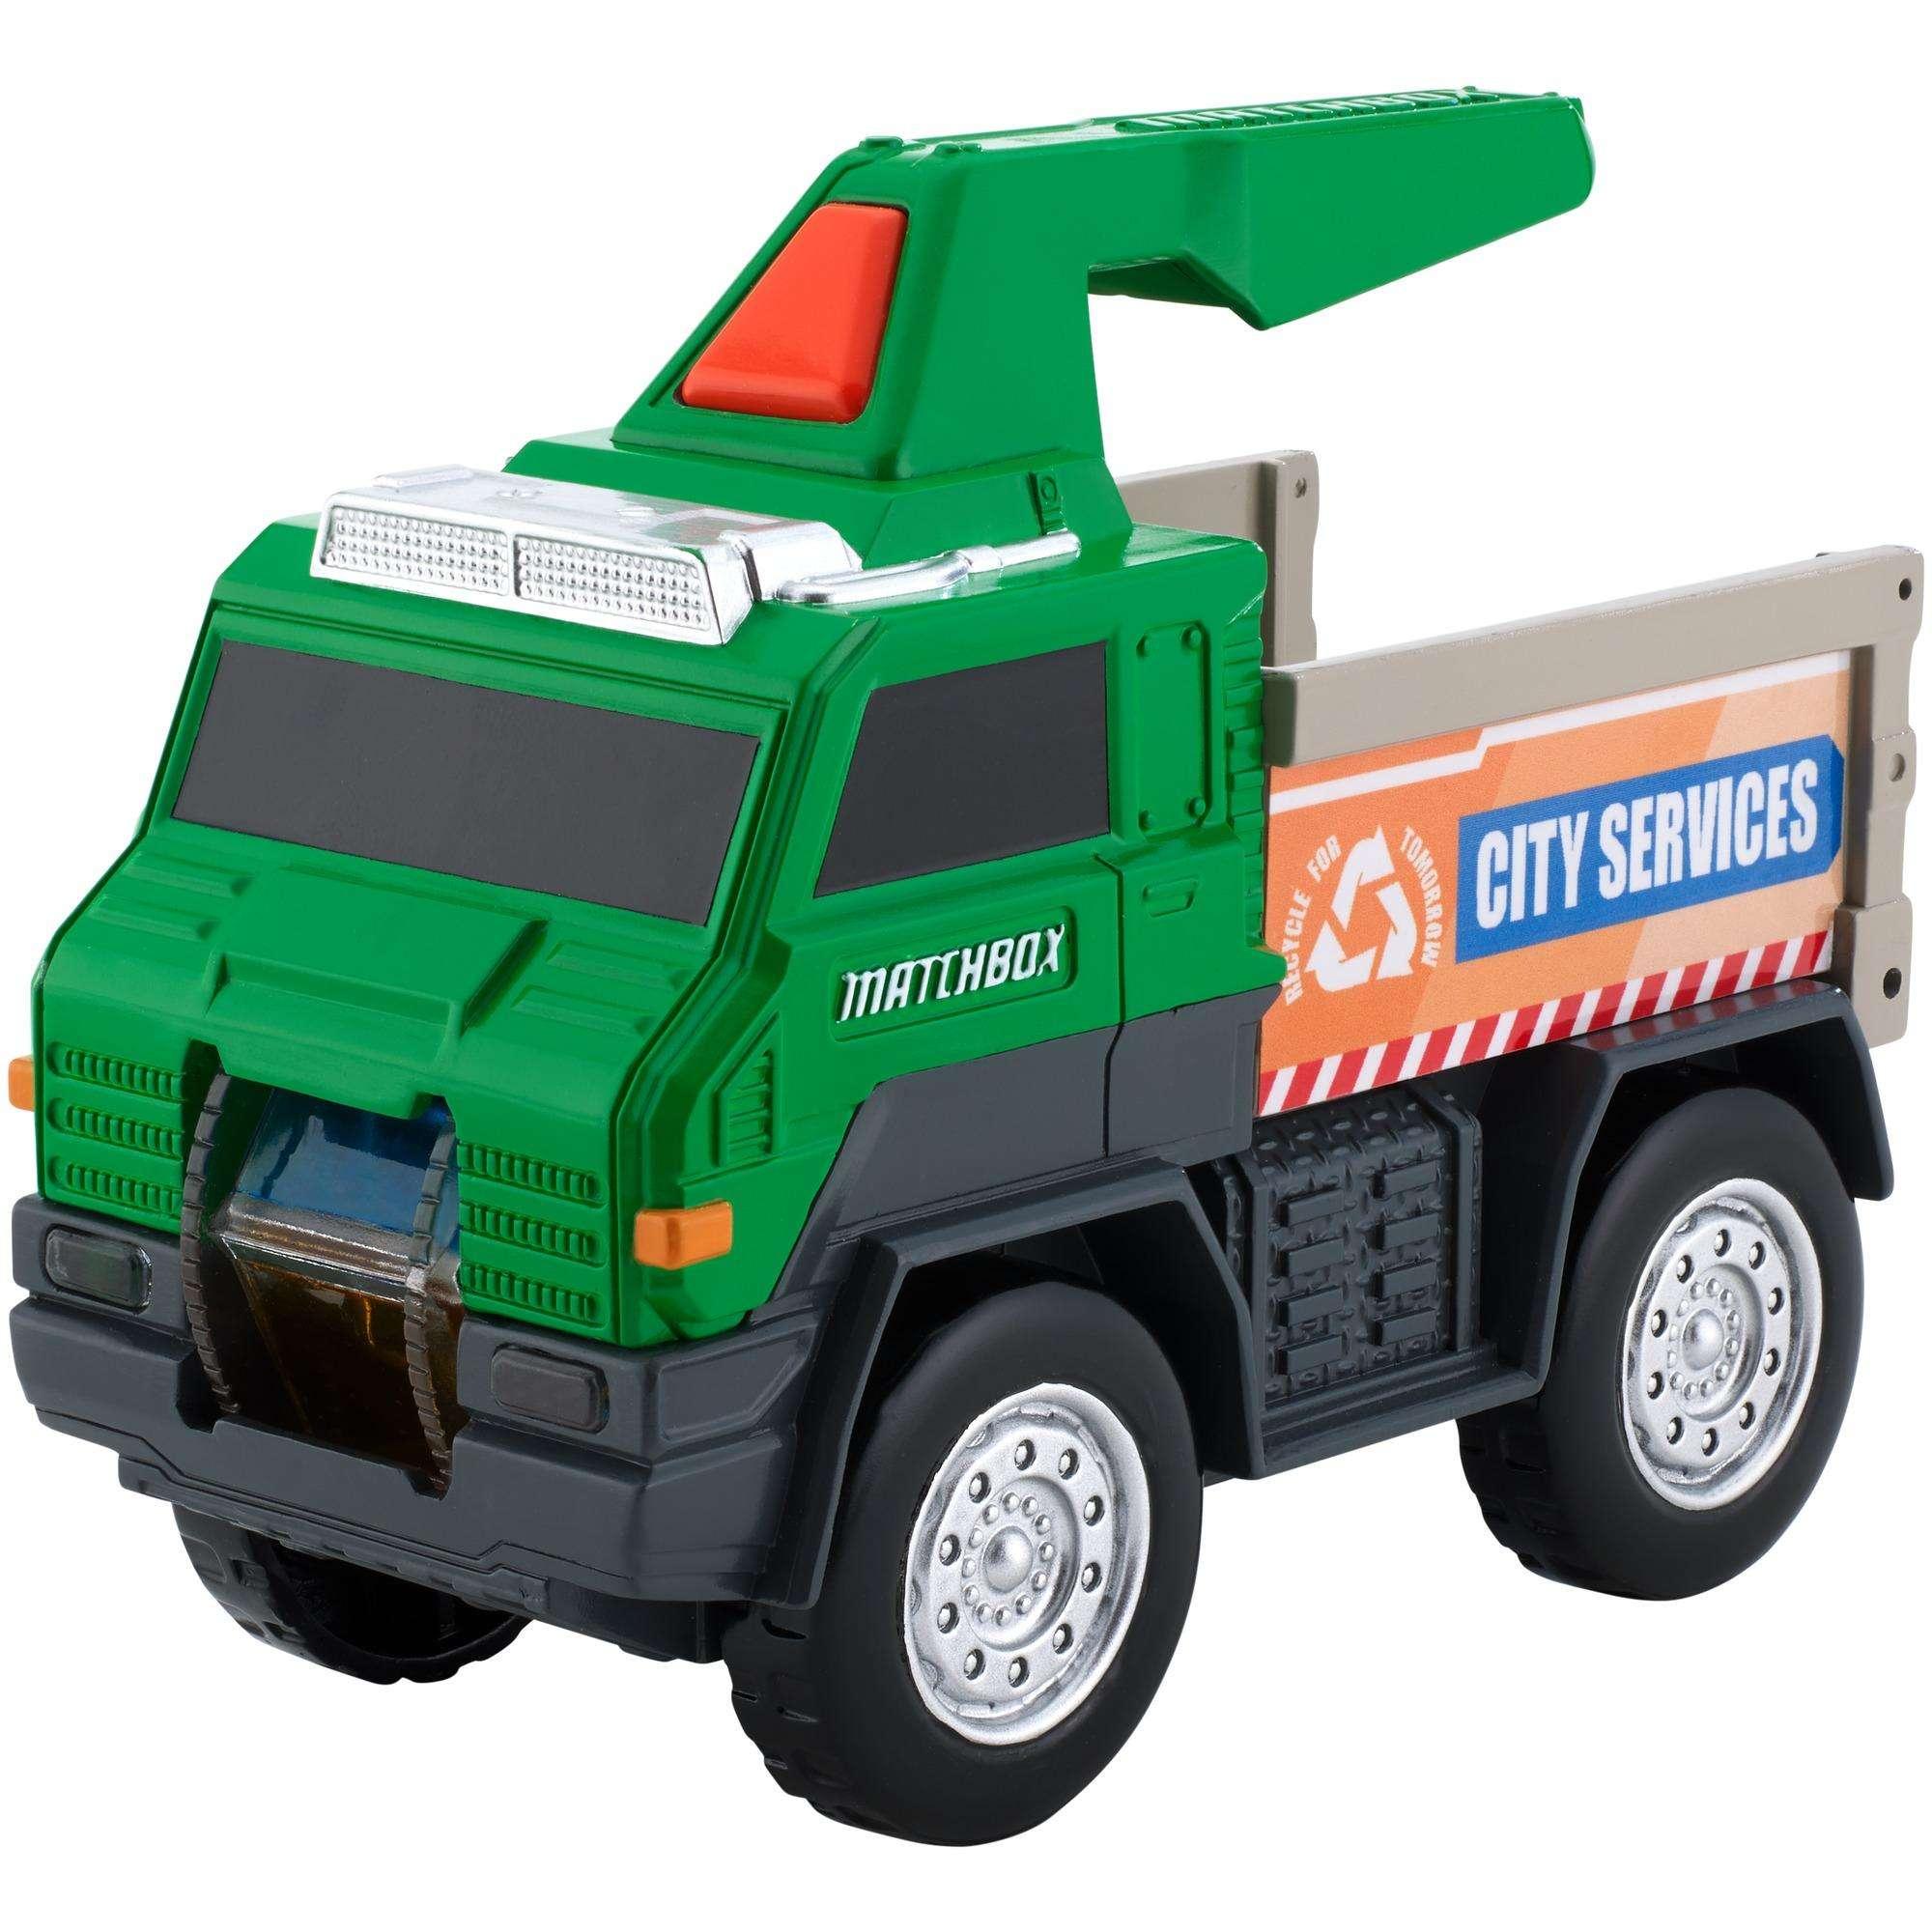 Mattel Matchbox Utility Truck Flashlight